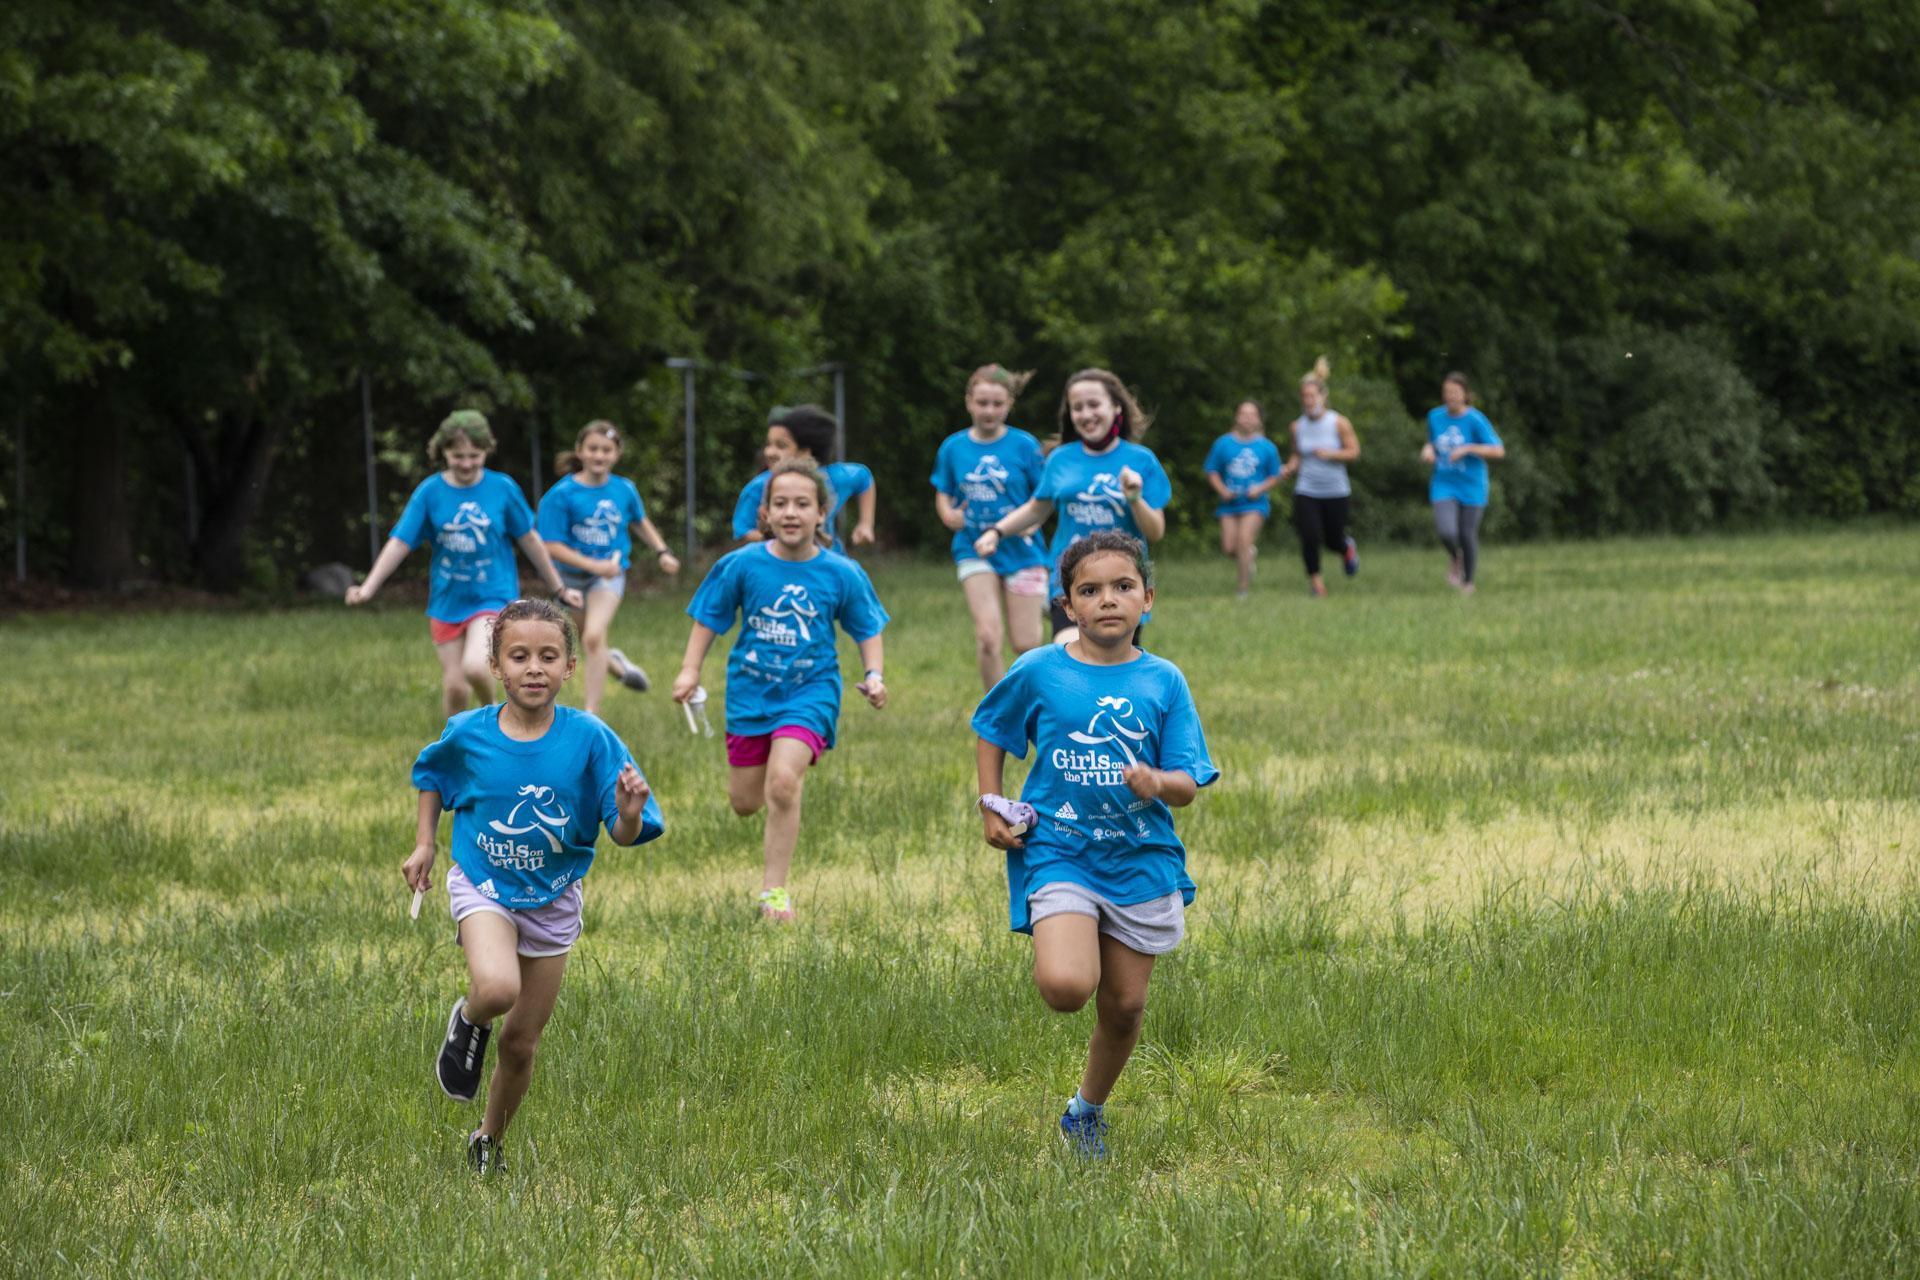 Students running through field